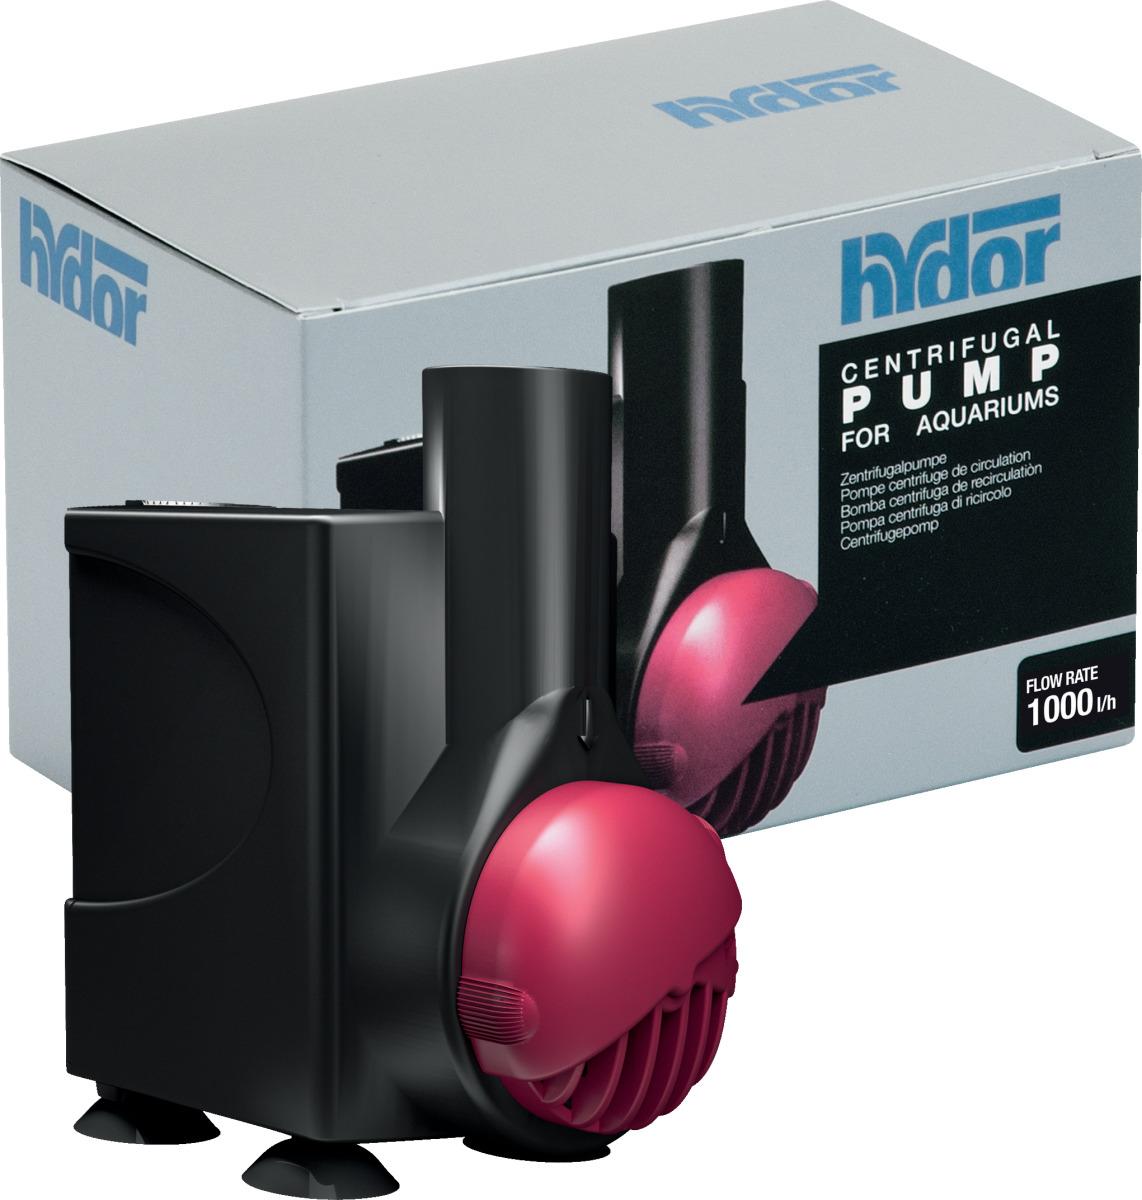 HYDOR Pico 1000 mini pompe universelle 1000 L/h pour aquarium